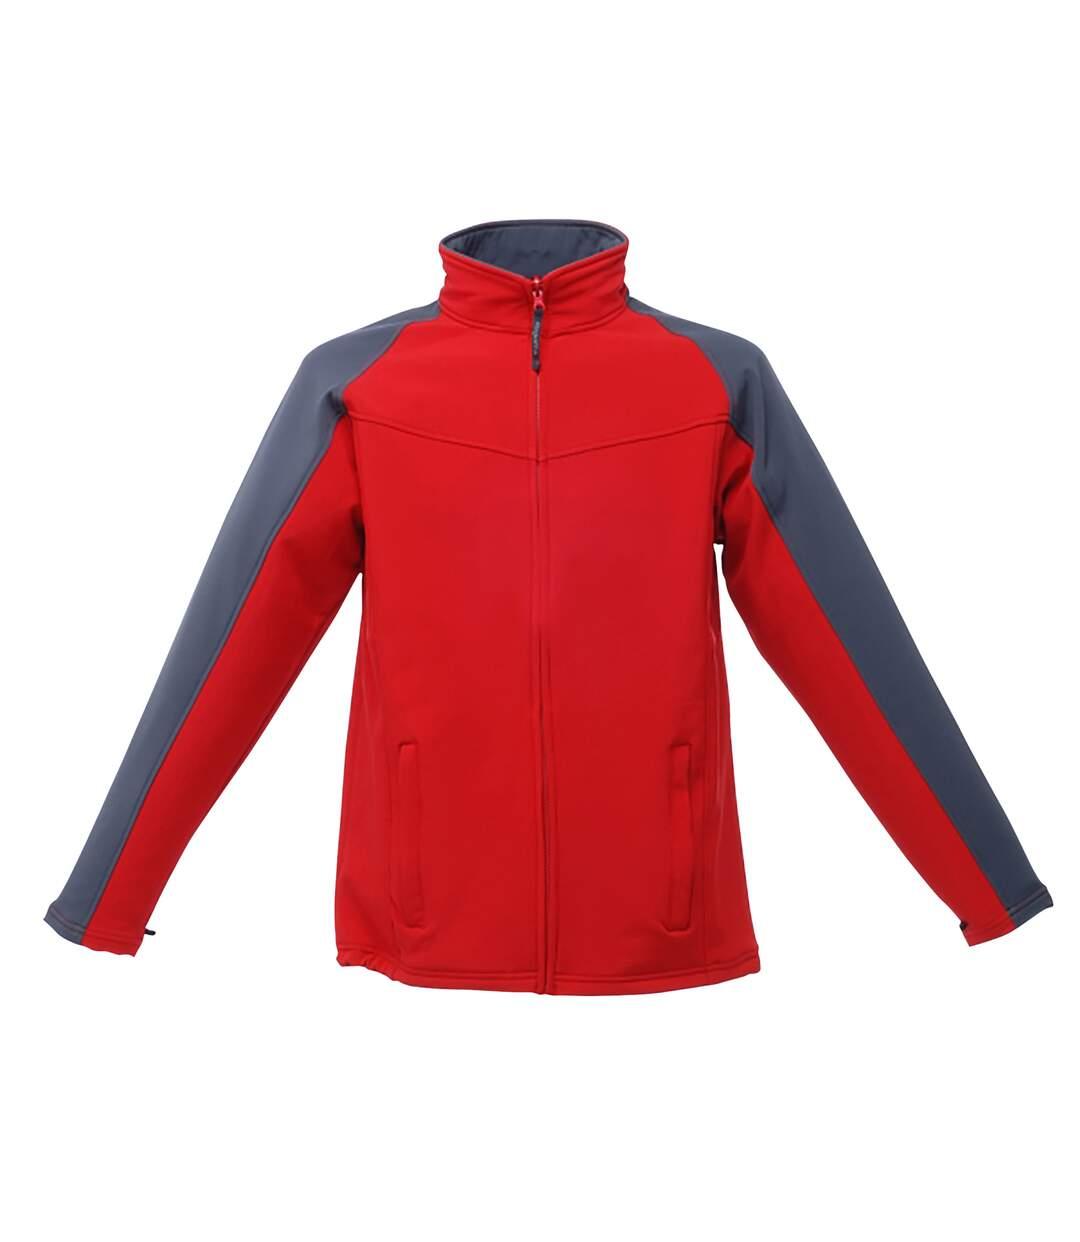 Regatta Uproar Mens Softshell Wind Resistant Fleece Jacket (Classic Red/Seal Grey) - UTRG1480